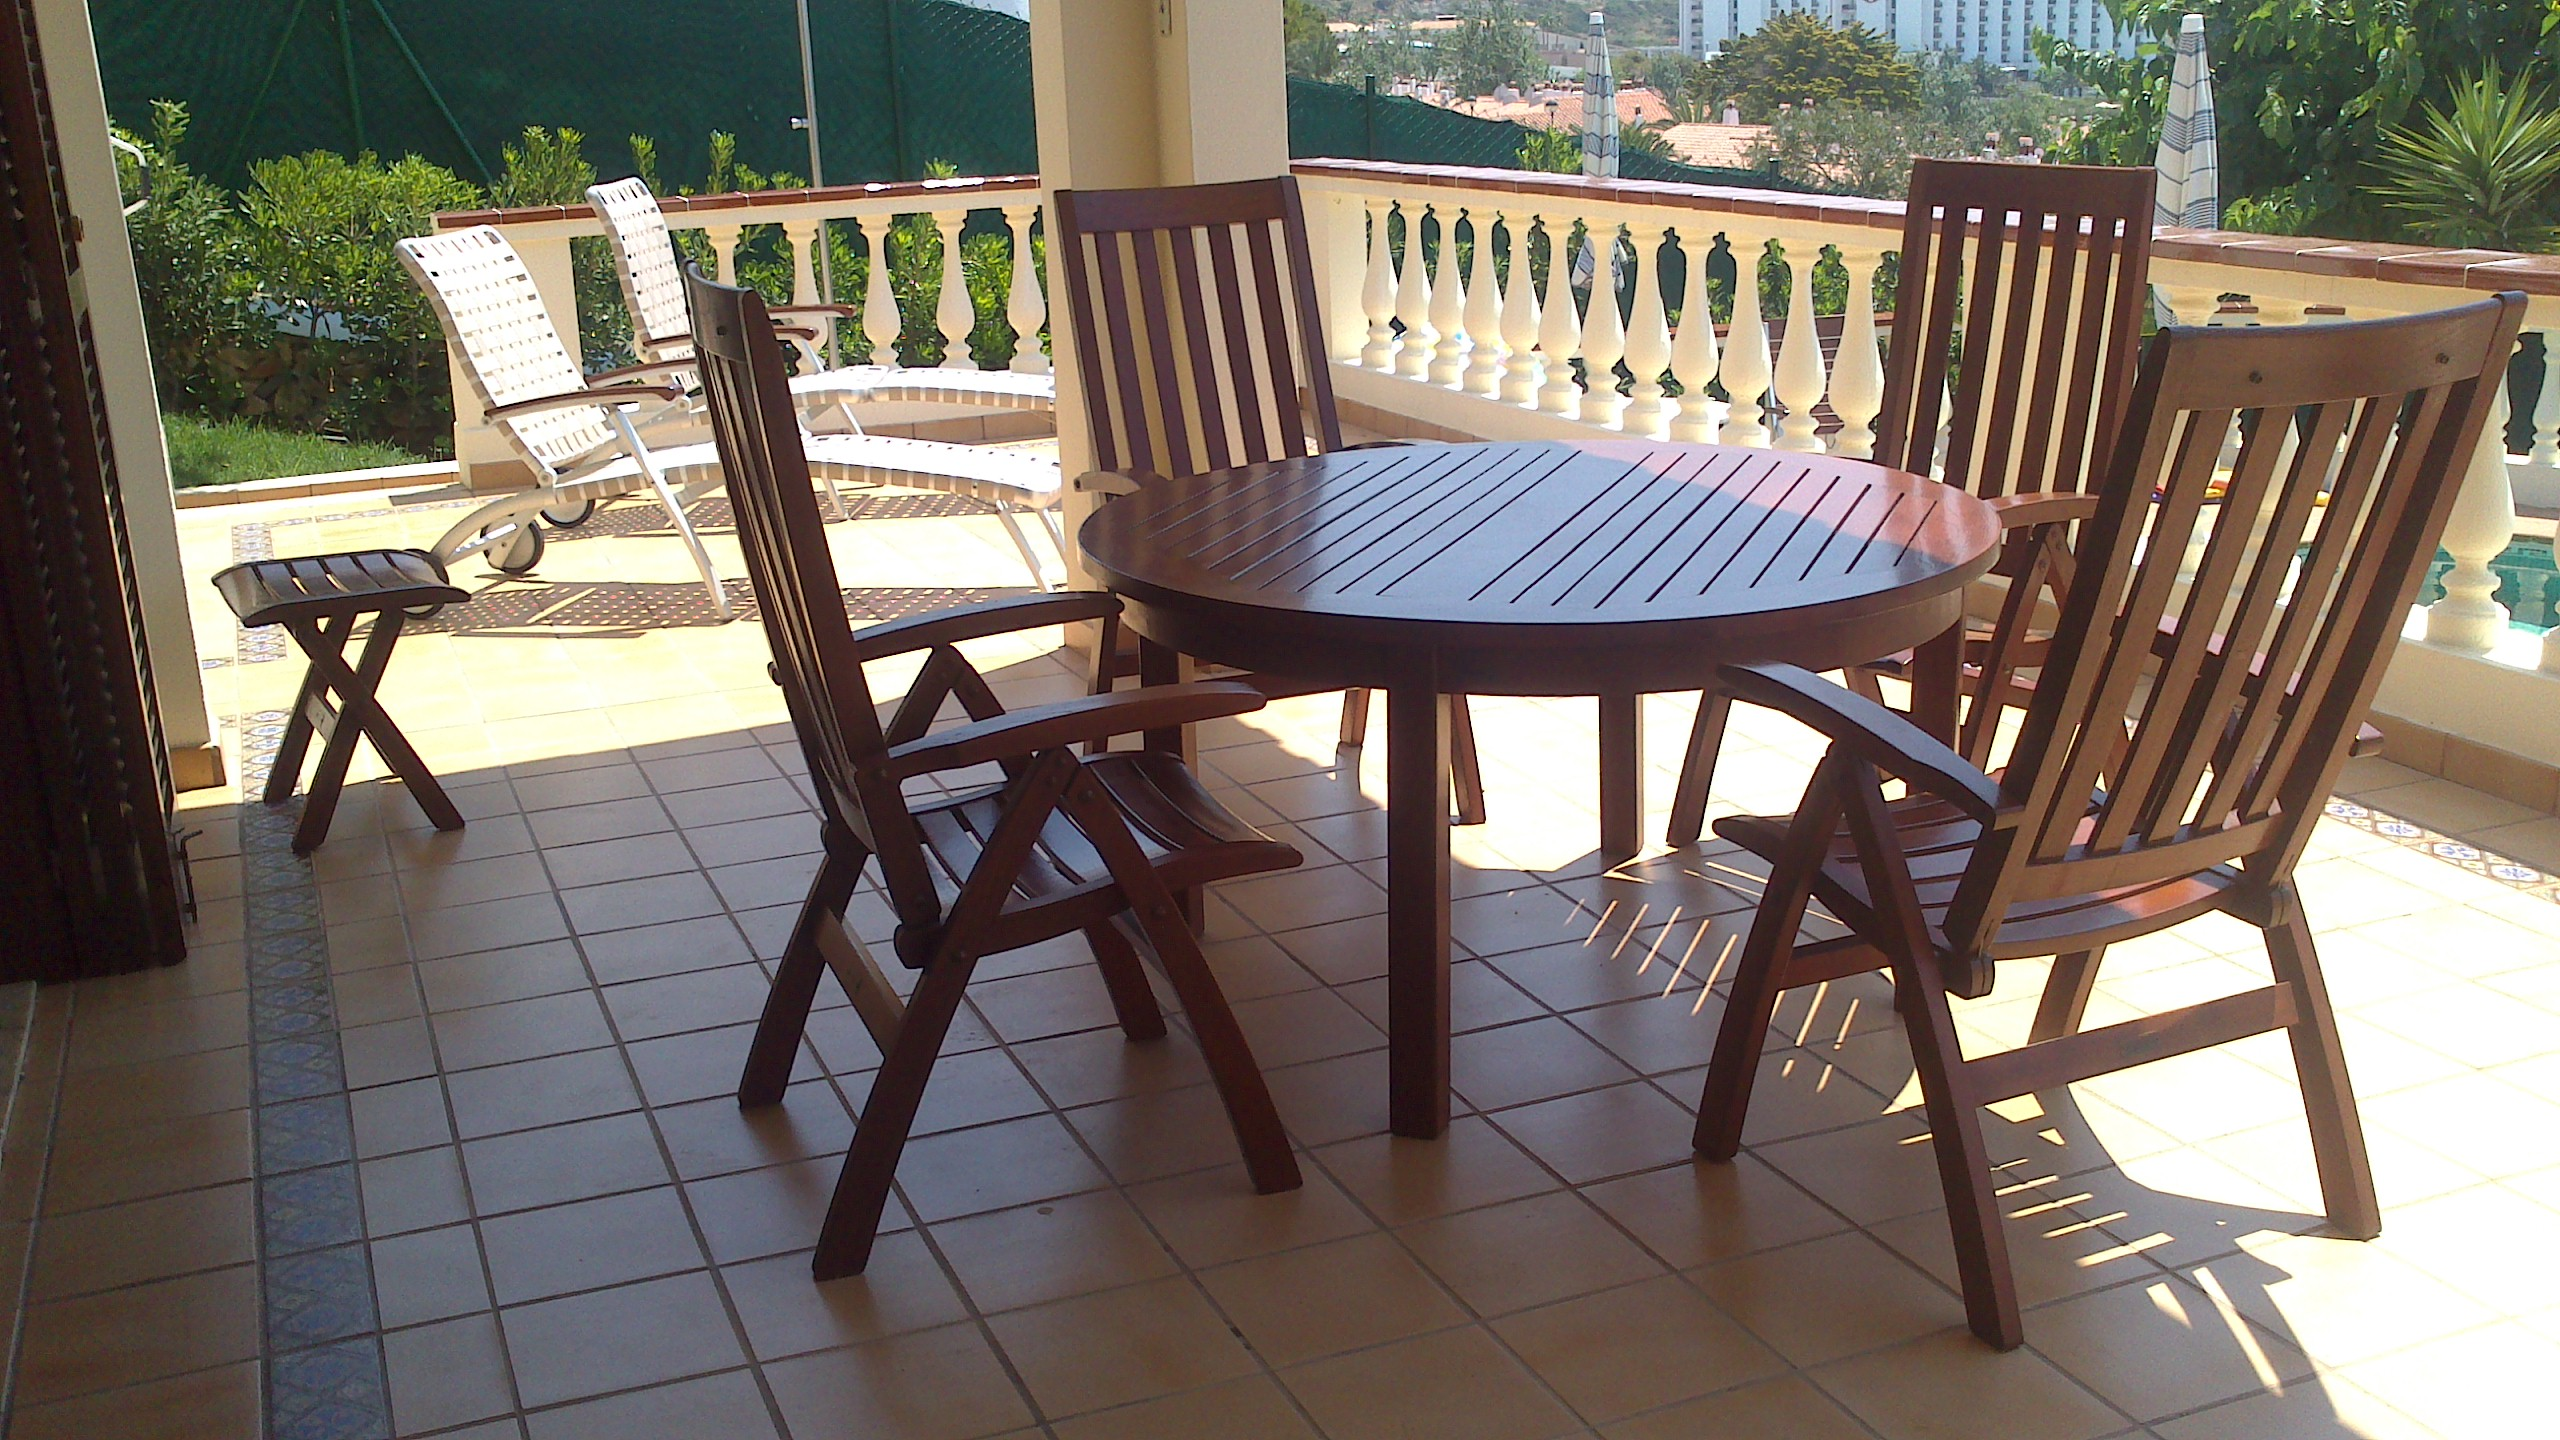 Restauracion Carpinteria Exterior Teka Puerta Cochera Y  # Muebles Teka Jardin